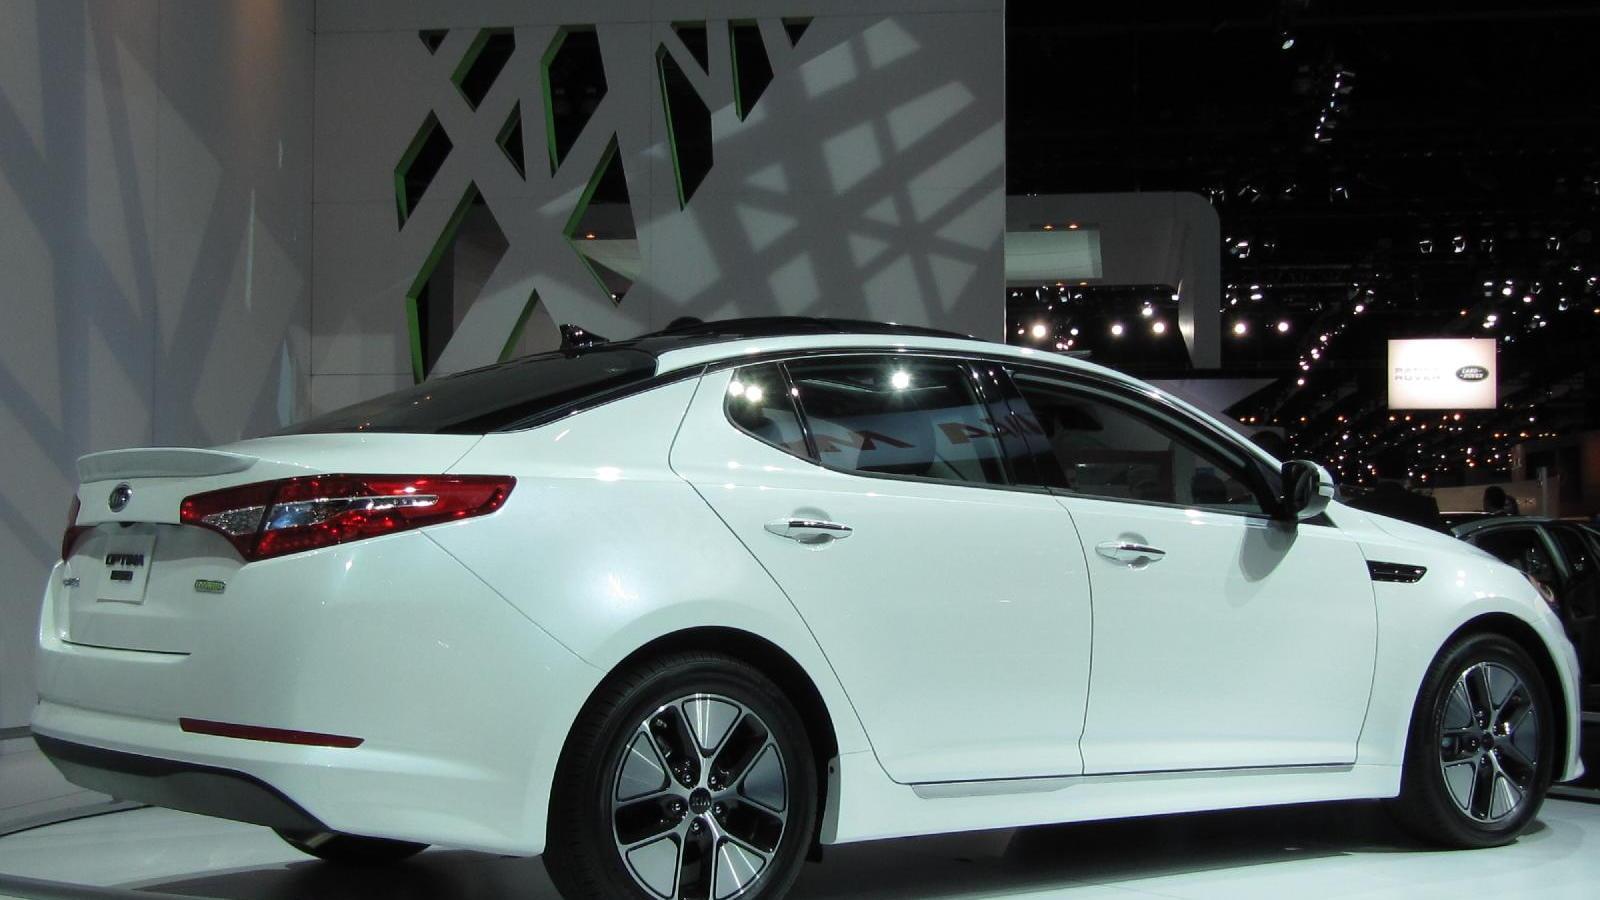 2011 Kia Optima Hybrid, at 2010 Los Angeles Auto Show